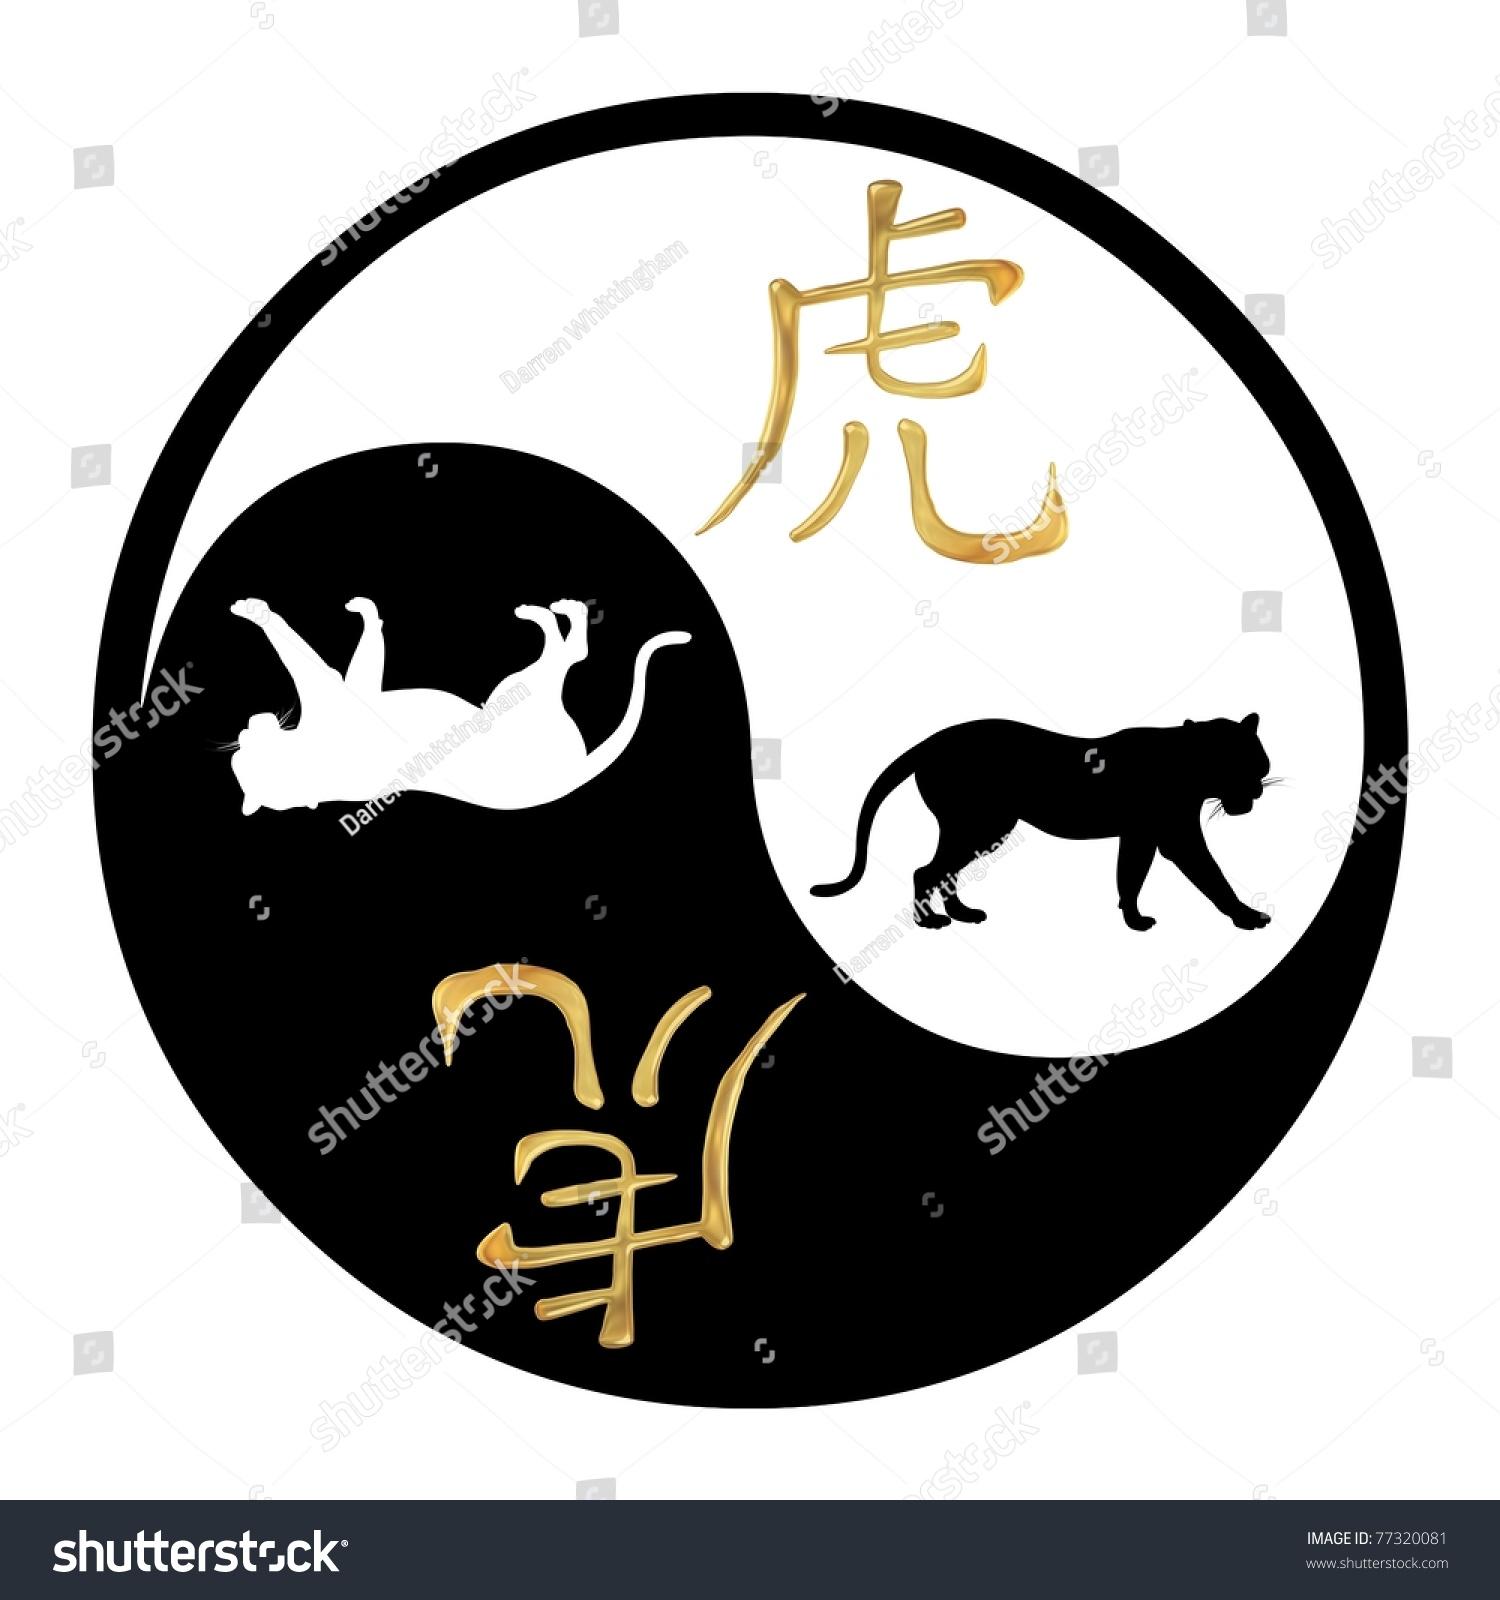 Yin Yang Symbol Chinese Text Image Stock Illustration 77320081